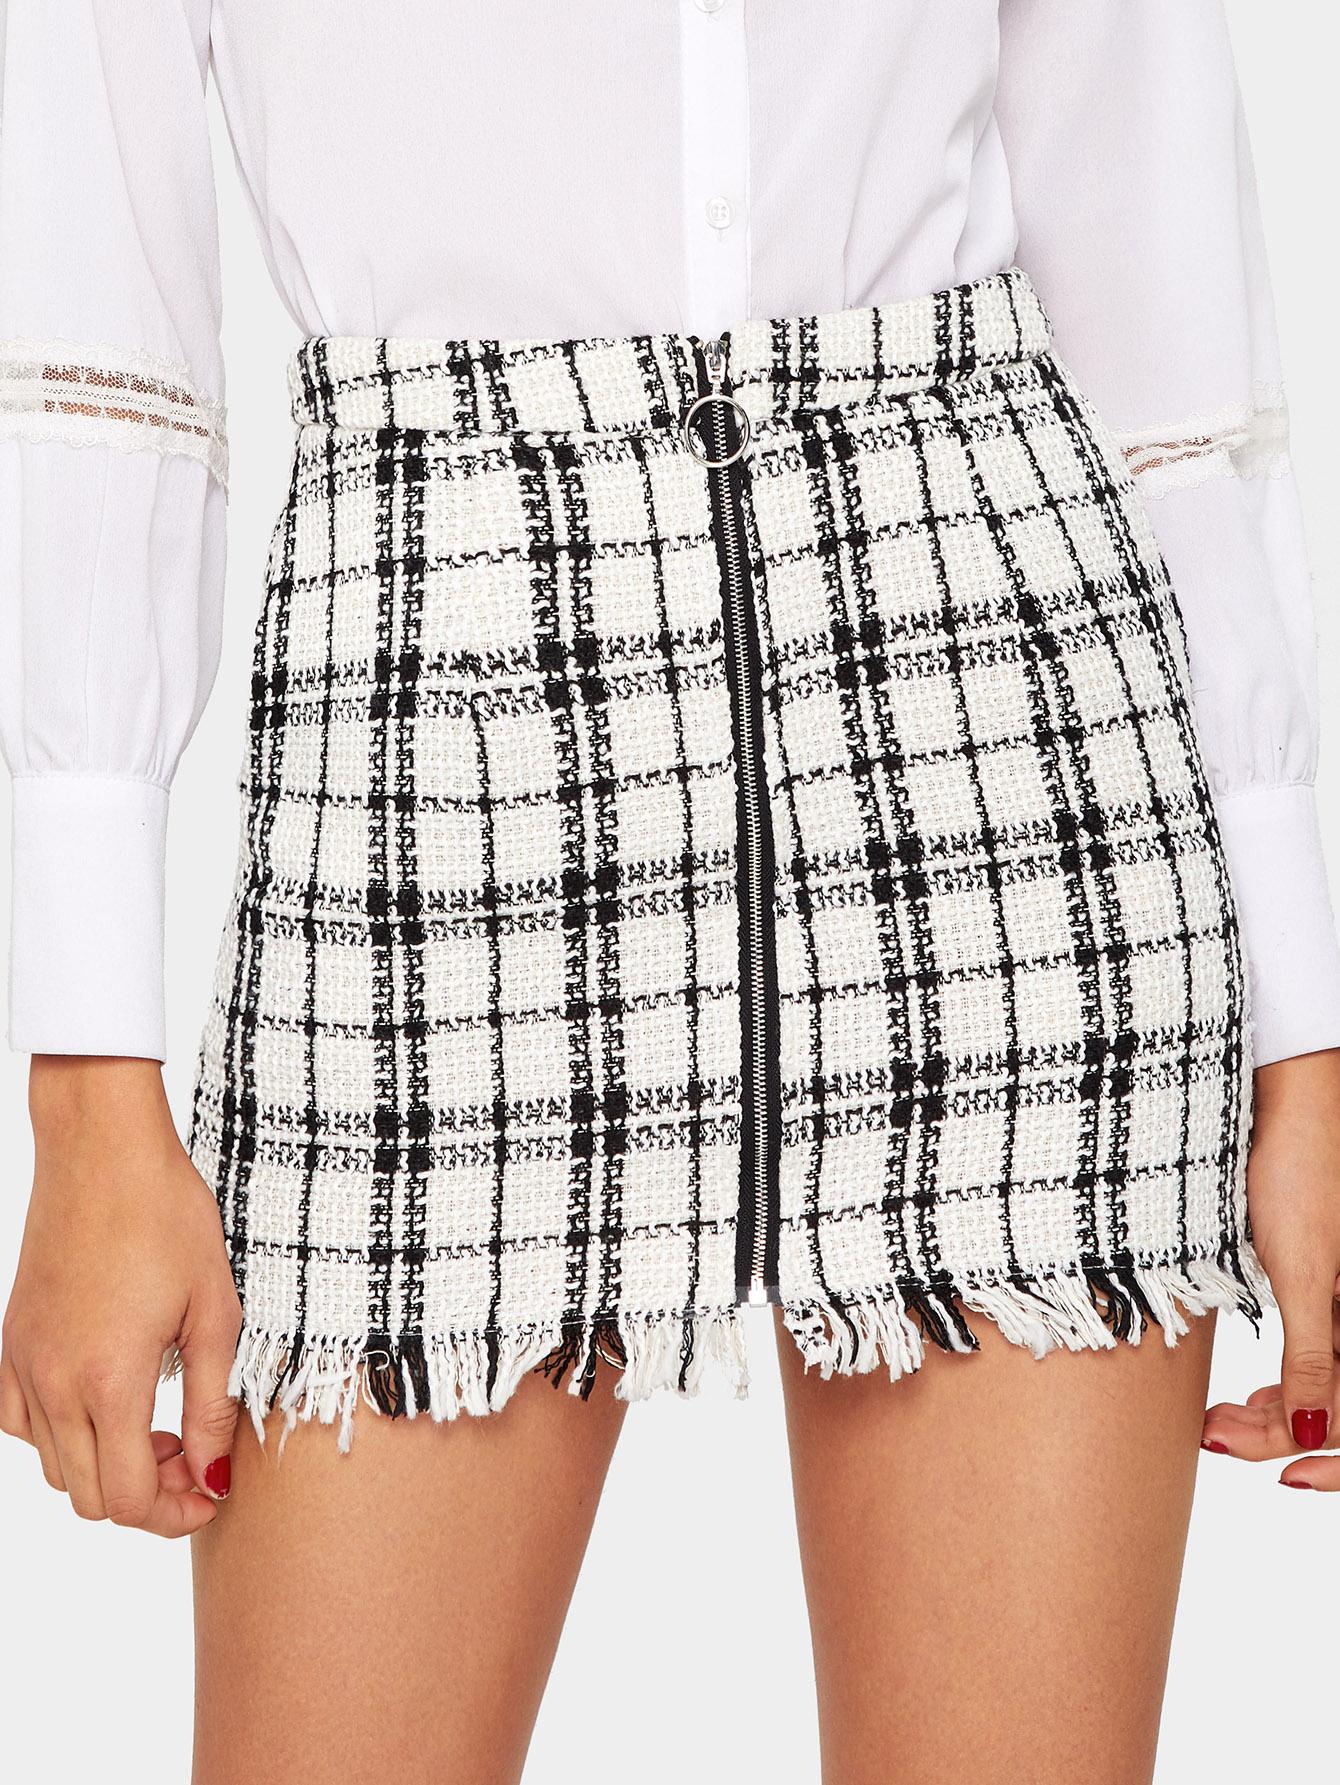 Купить Твидовая юбка на молнии с бахромой, Maiara, SheIn